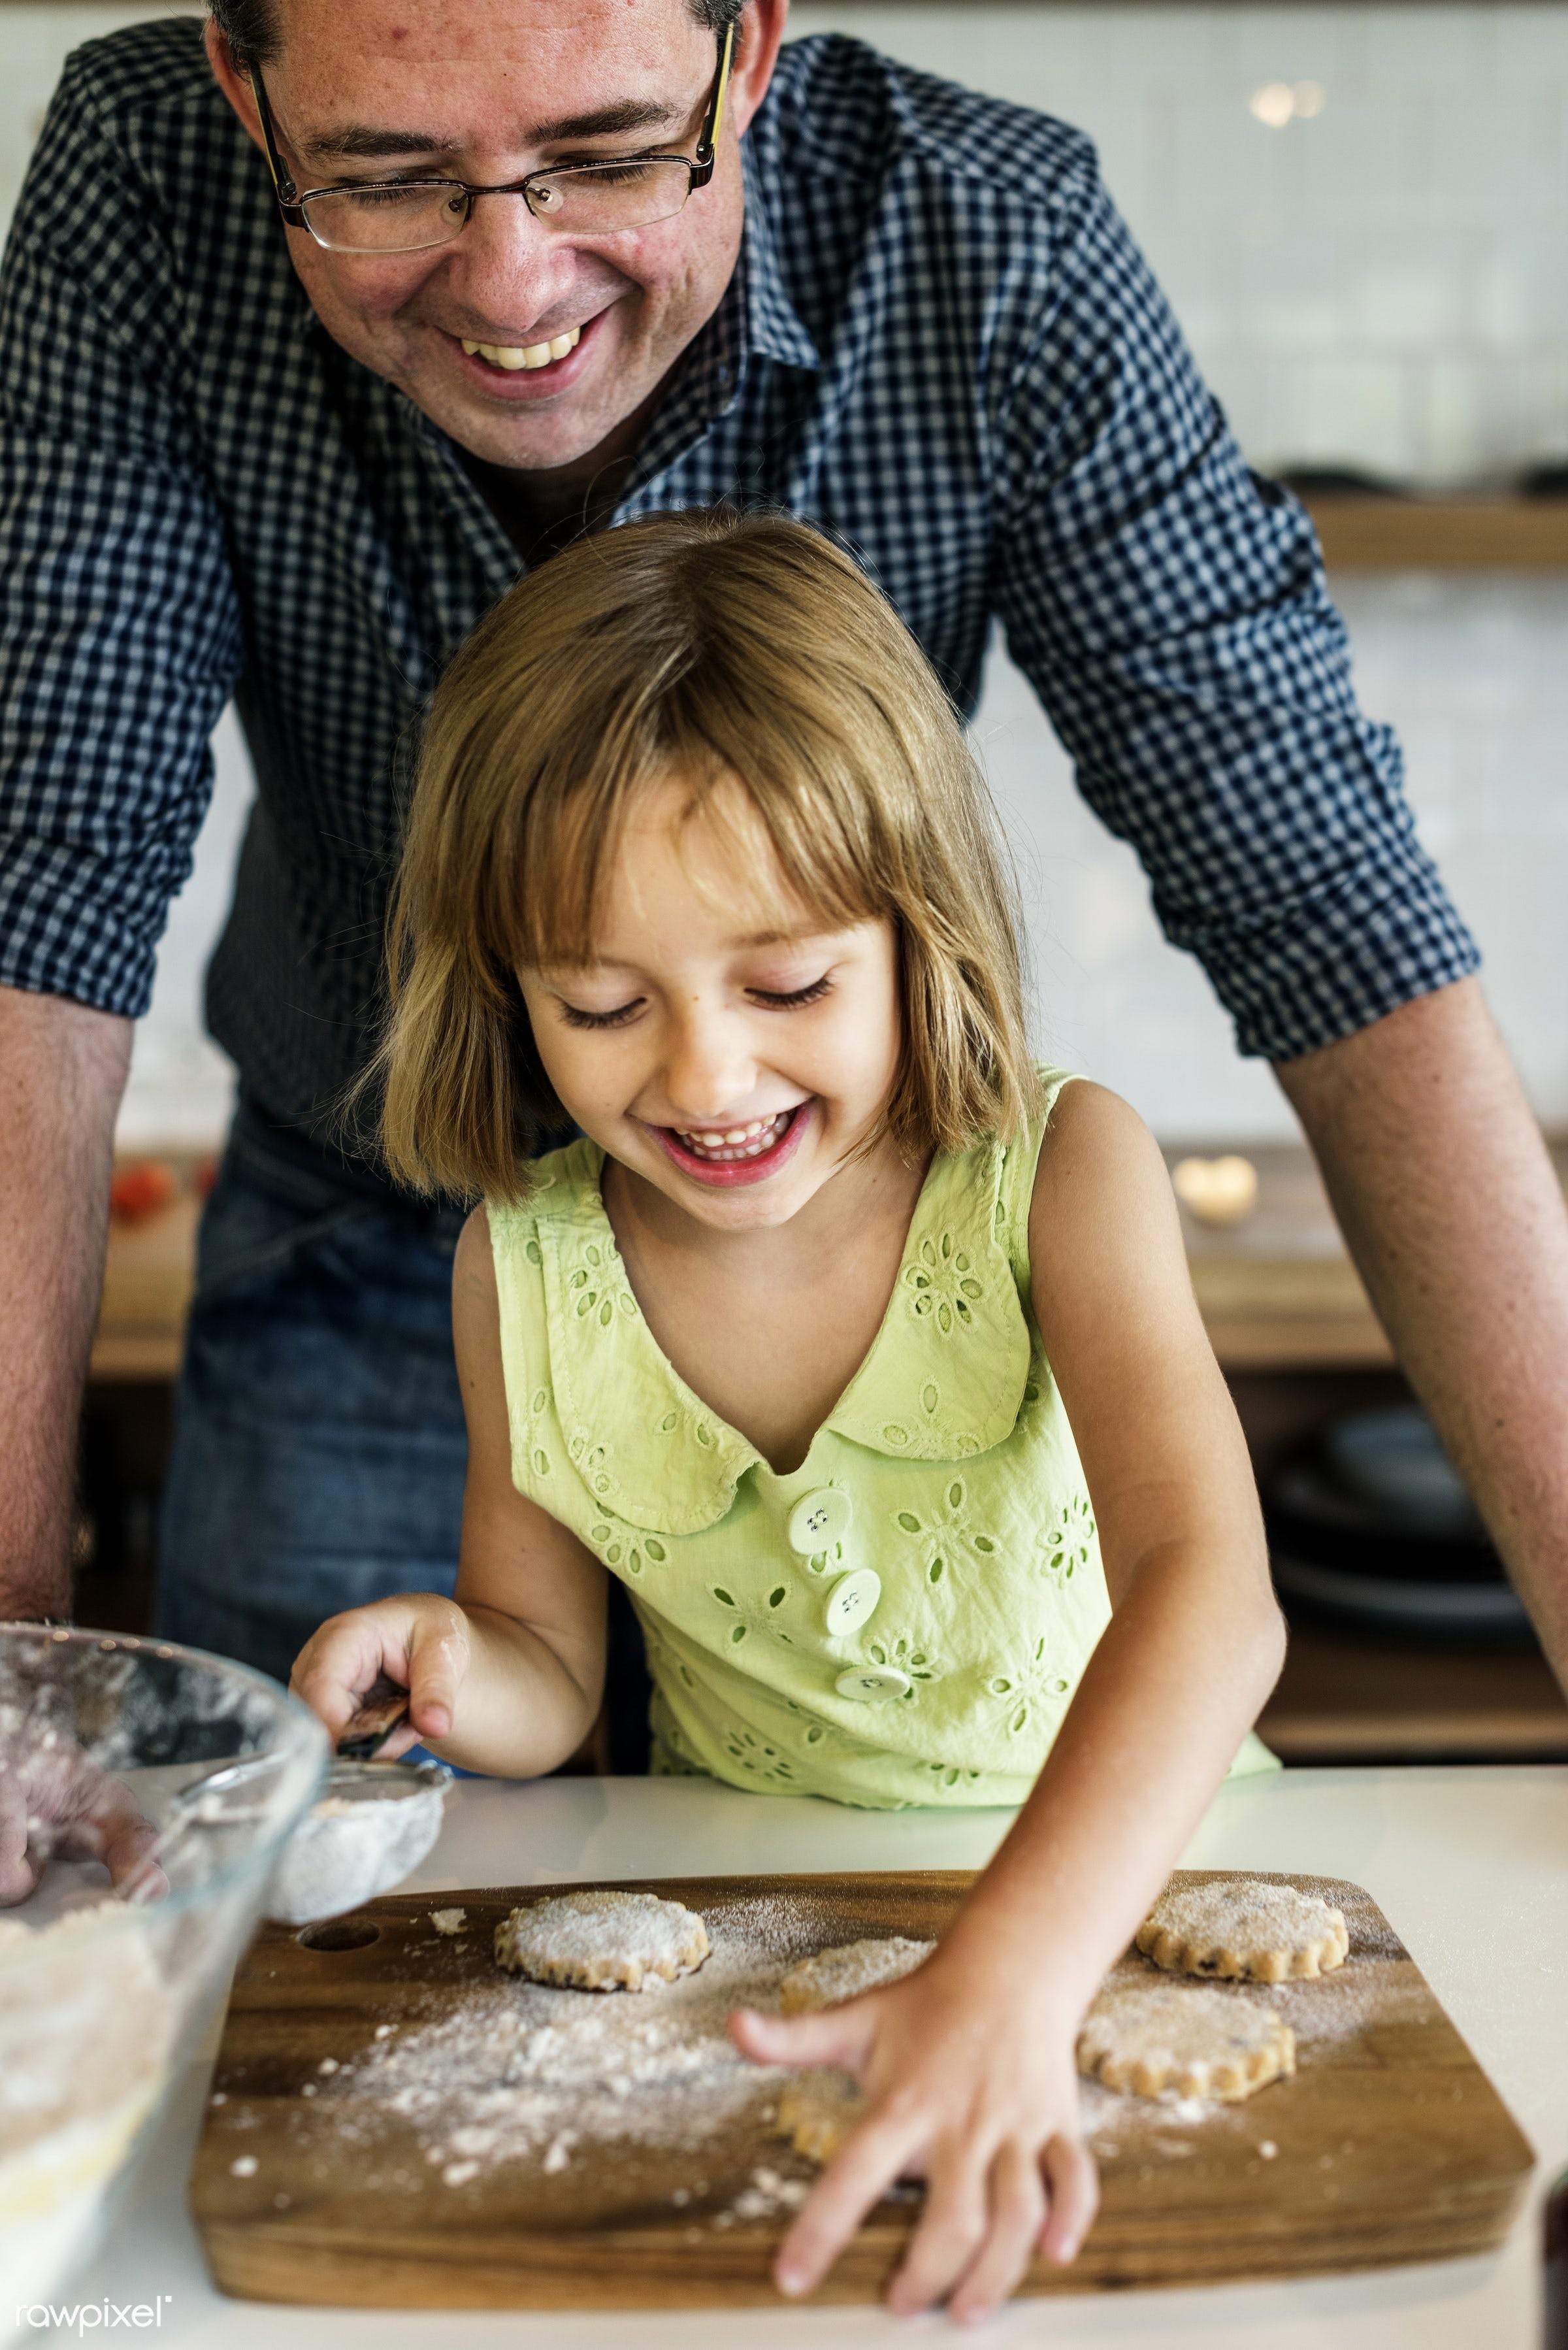 activity, american, bake, baker, bakery, baking, biscuit, blond, caucasian, child, cookies, dad, daughter, dessert, european...